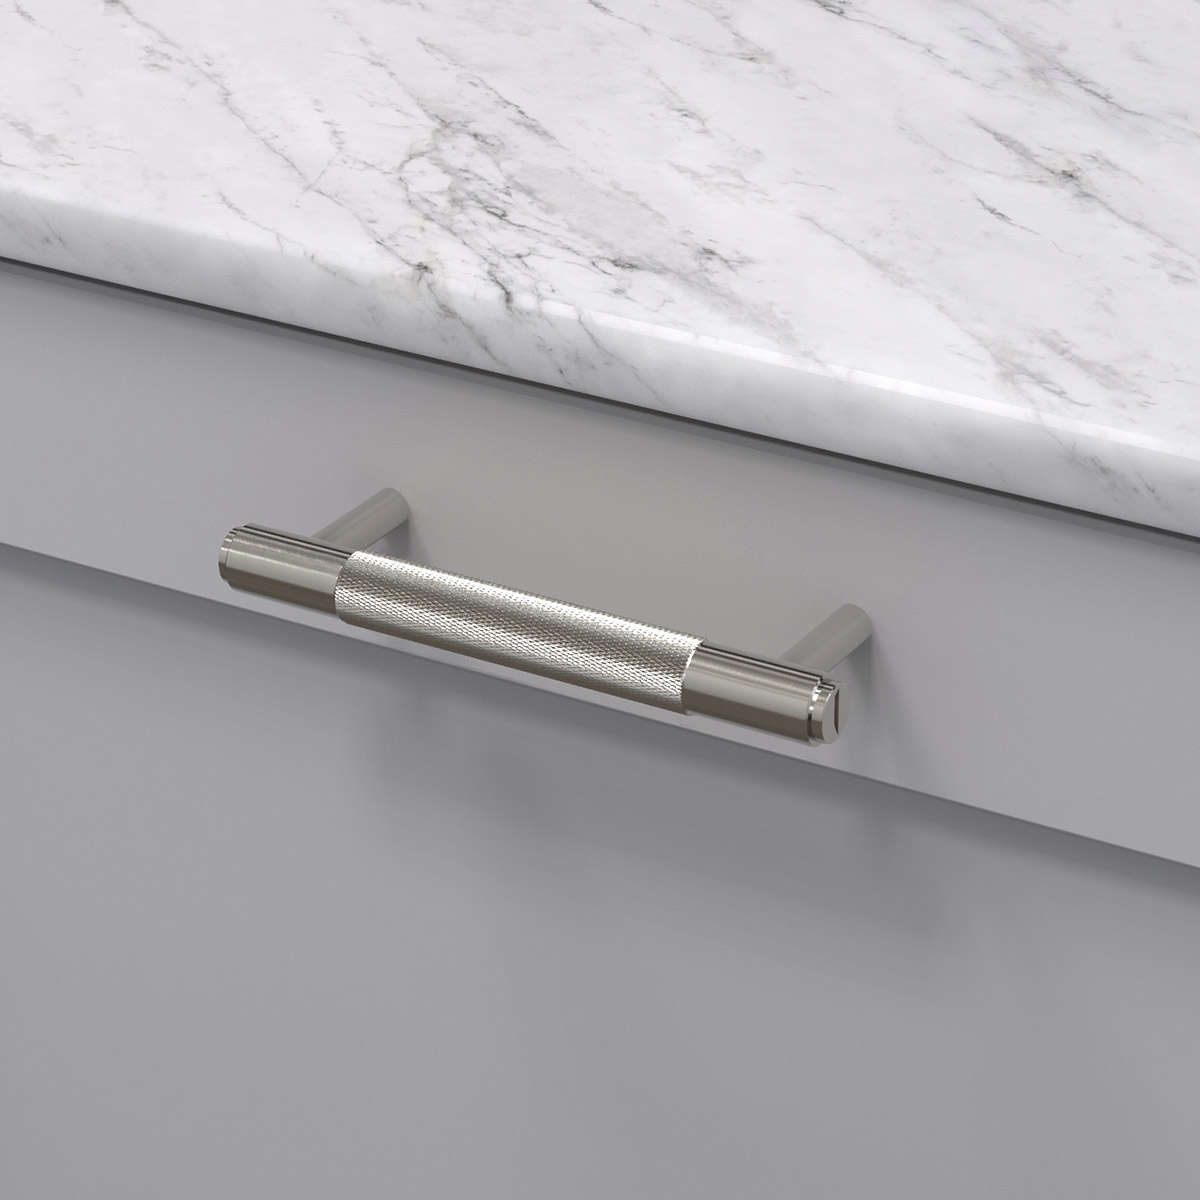 pull bar stål uk pb h 160 st a cc 125 mm ncs s 3000 n marmor carrara